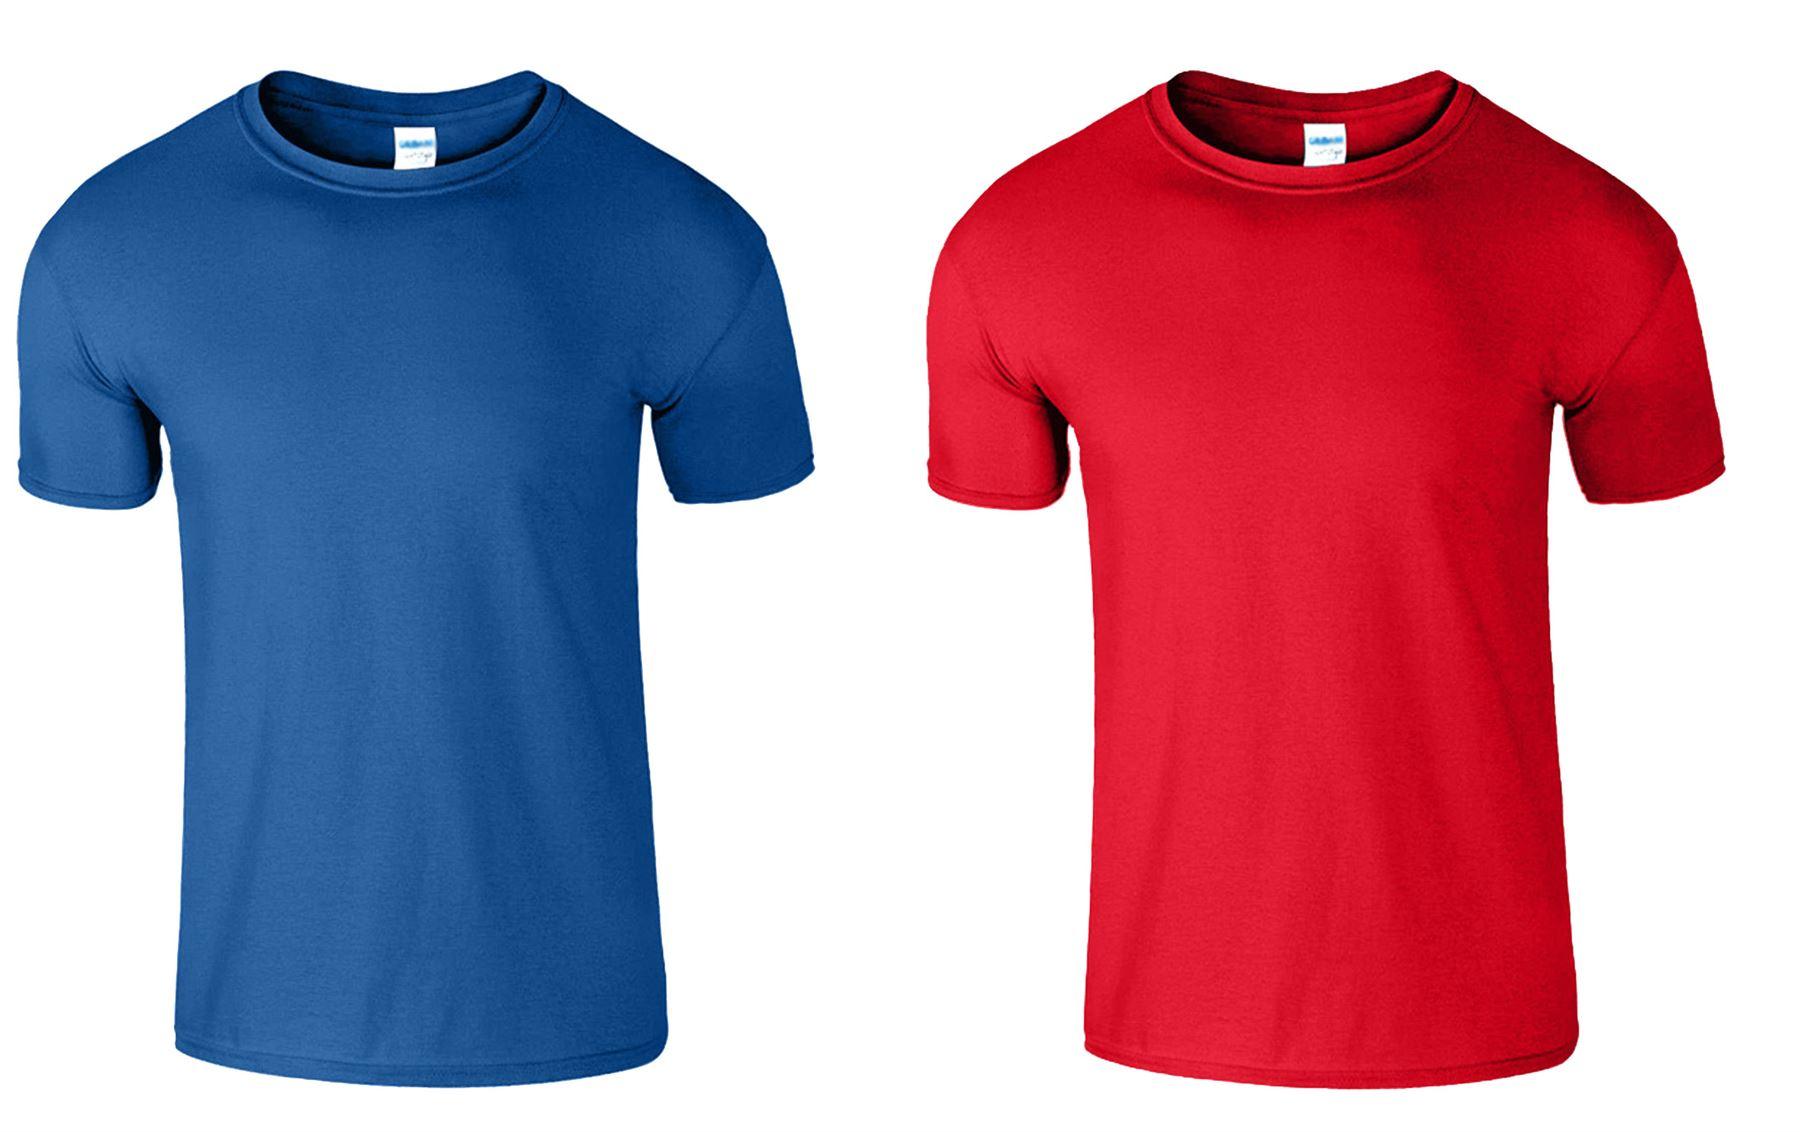 2 Pack New Mens Gildan Plain Tshirt Unisex T Shirts Soft